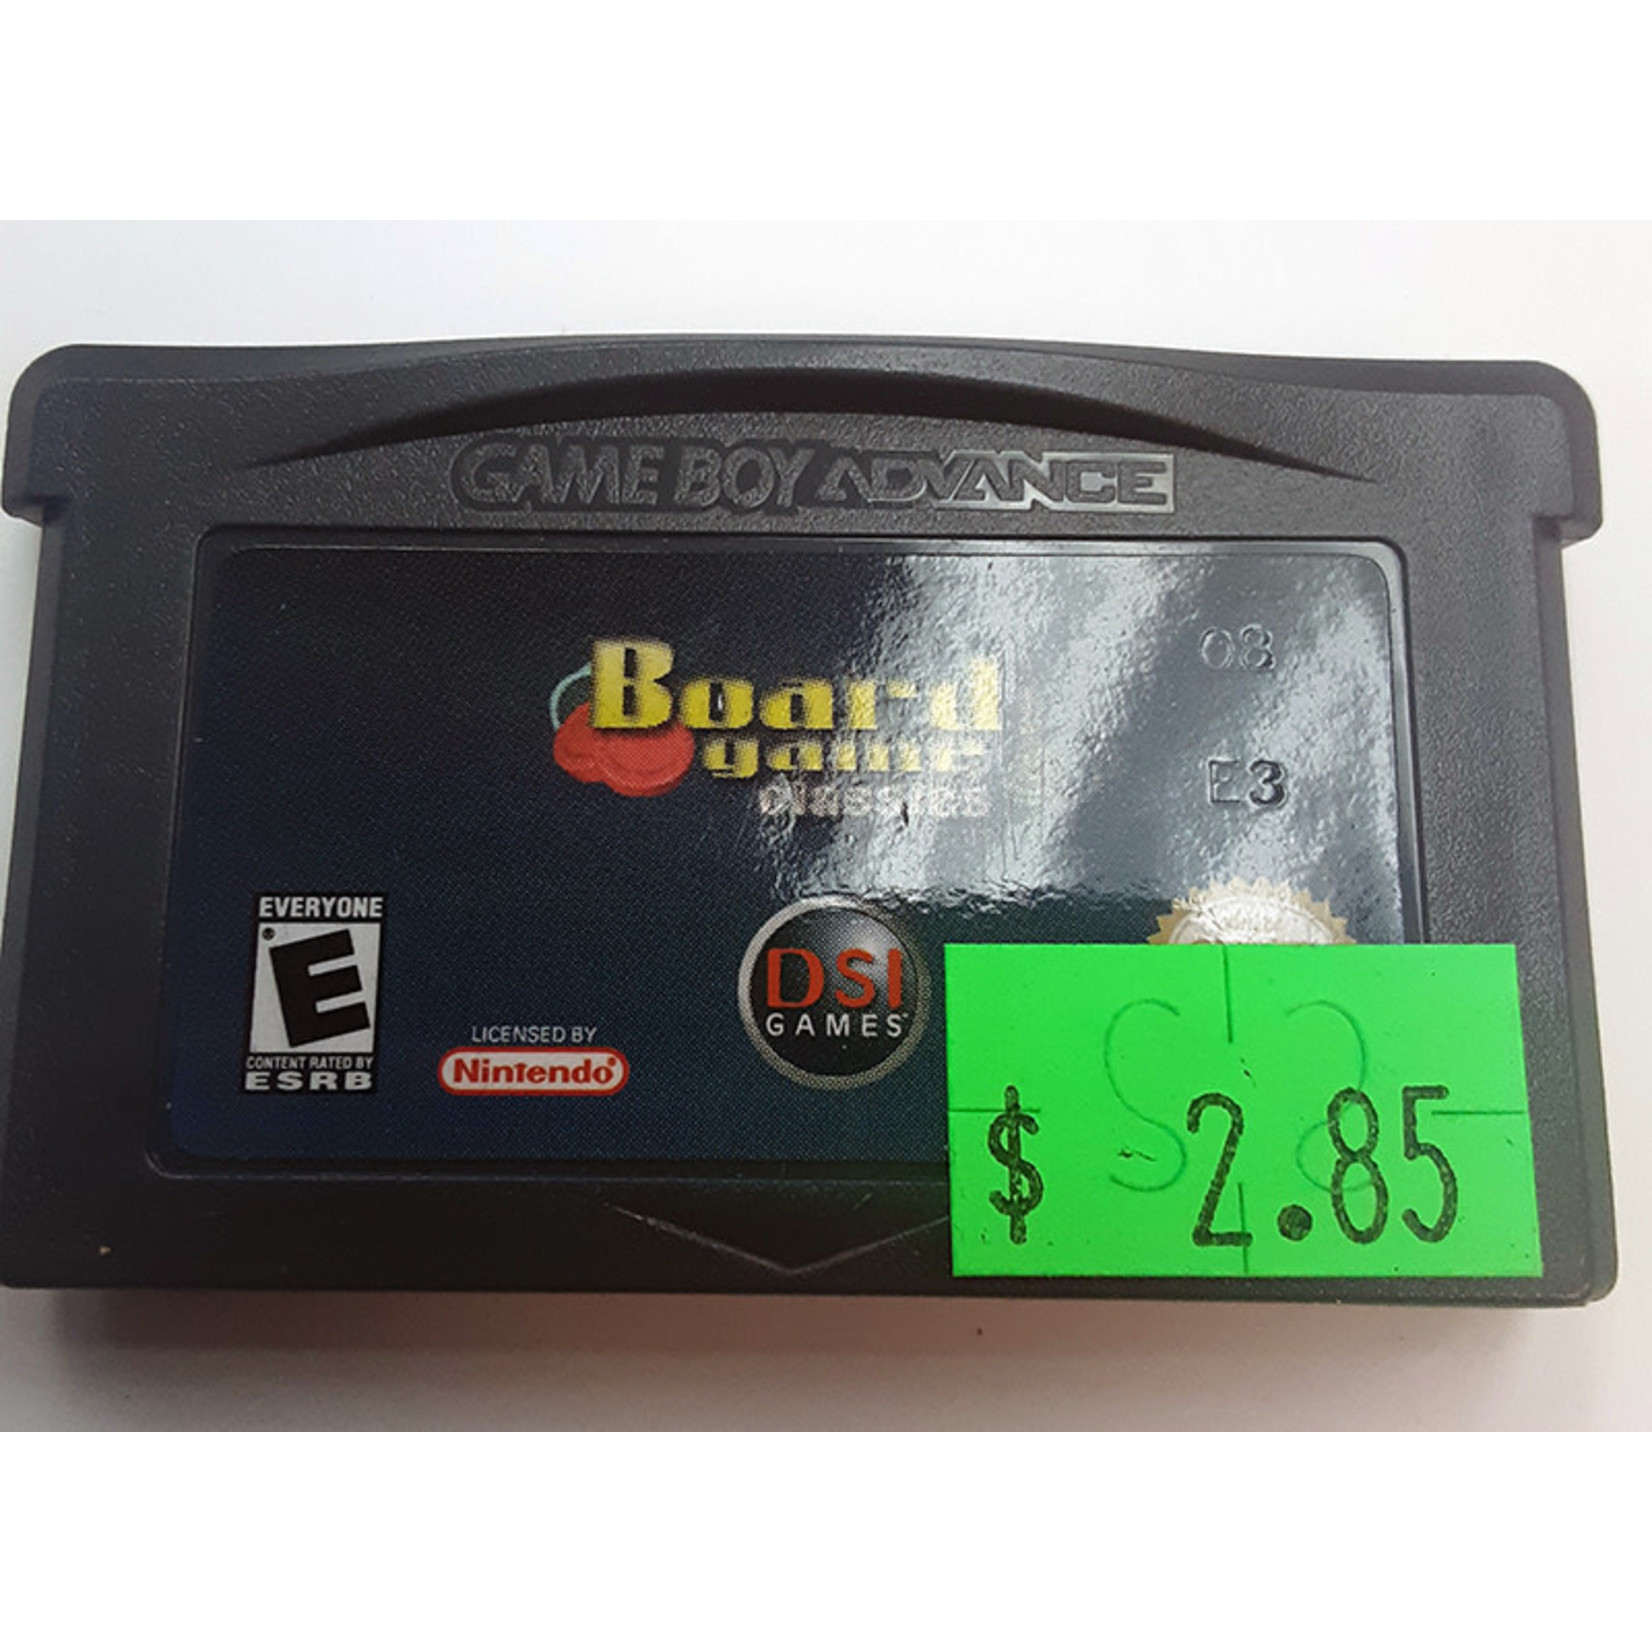 GBAu-Board Game Classics (cartridge)